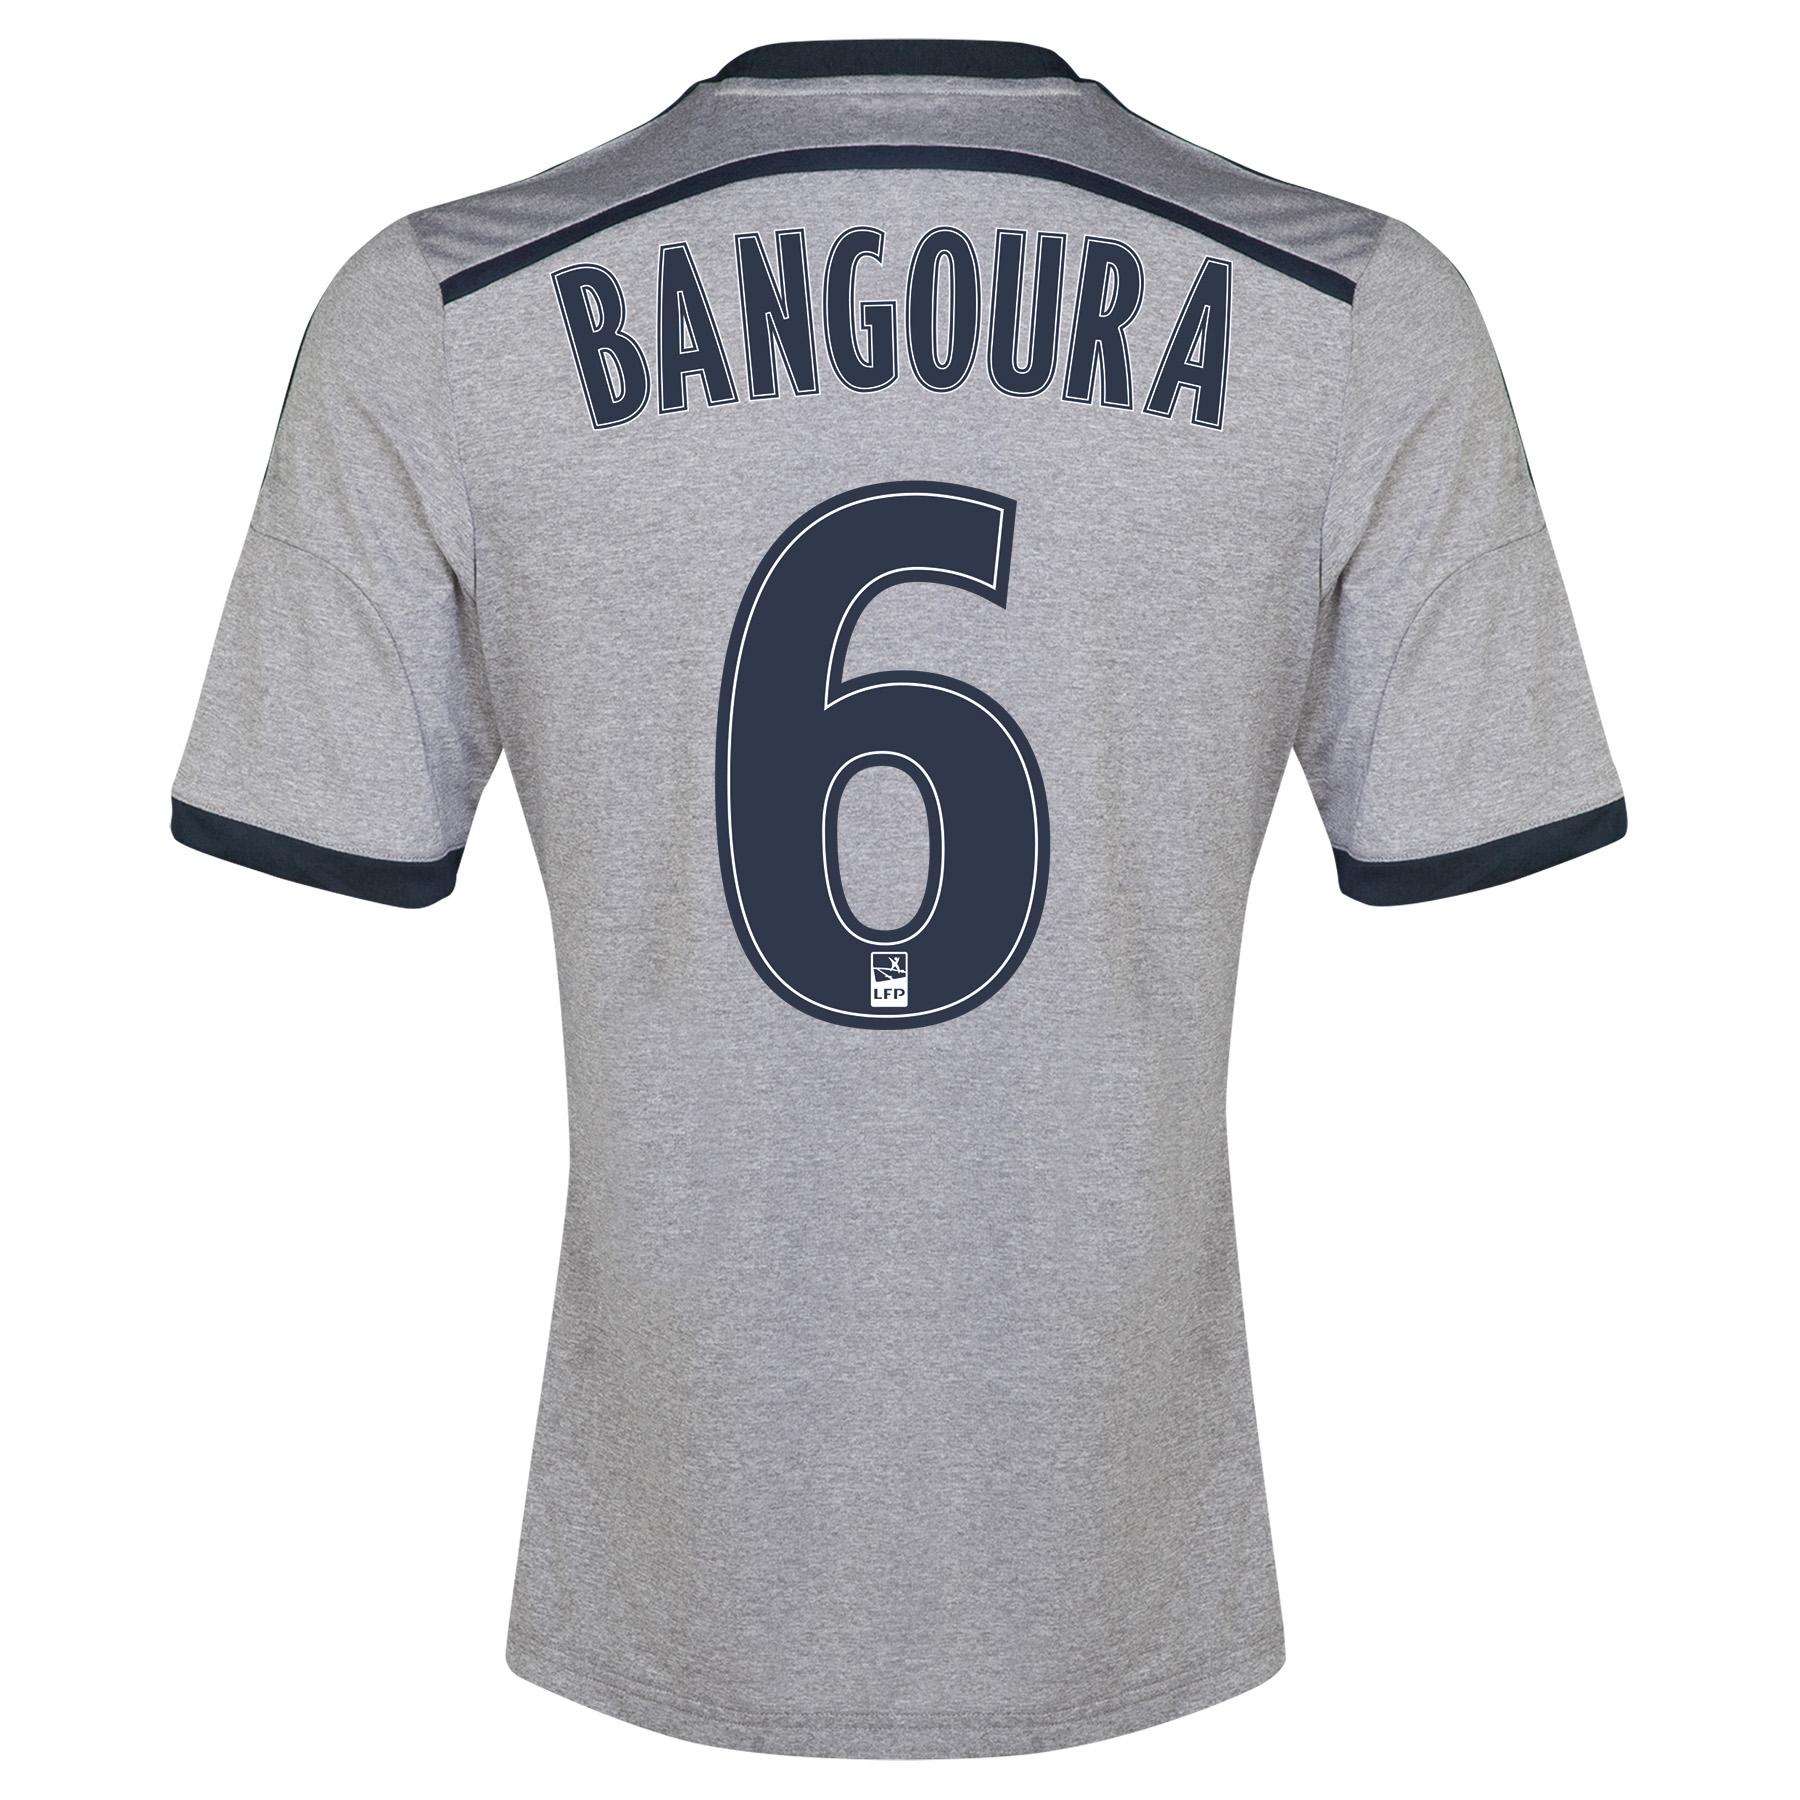 Olympique de Marseille Away Shirt Short Sleeve - Junior 2014/15 Silver with Bangoura 6 printing